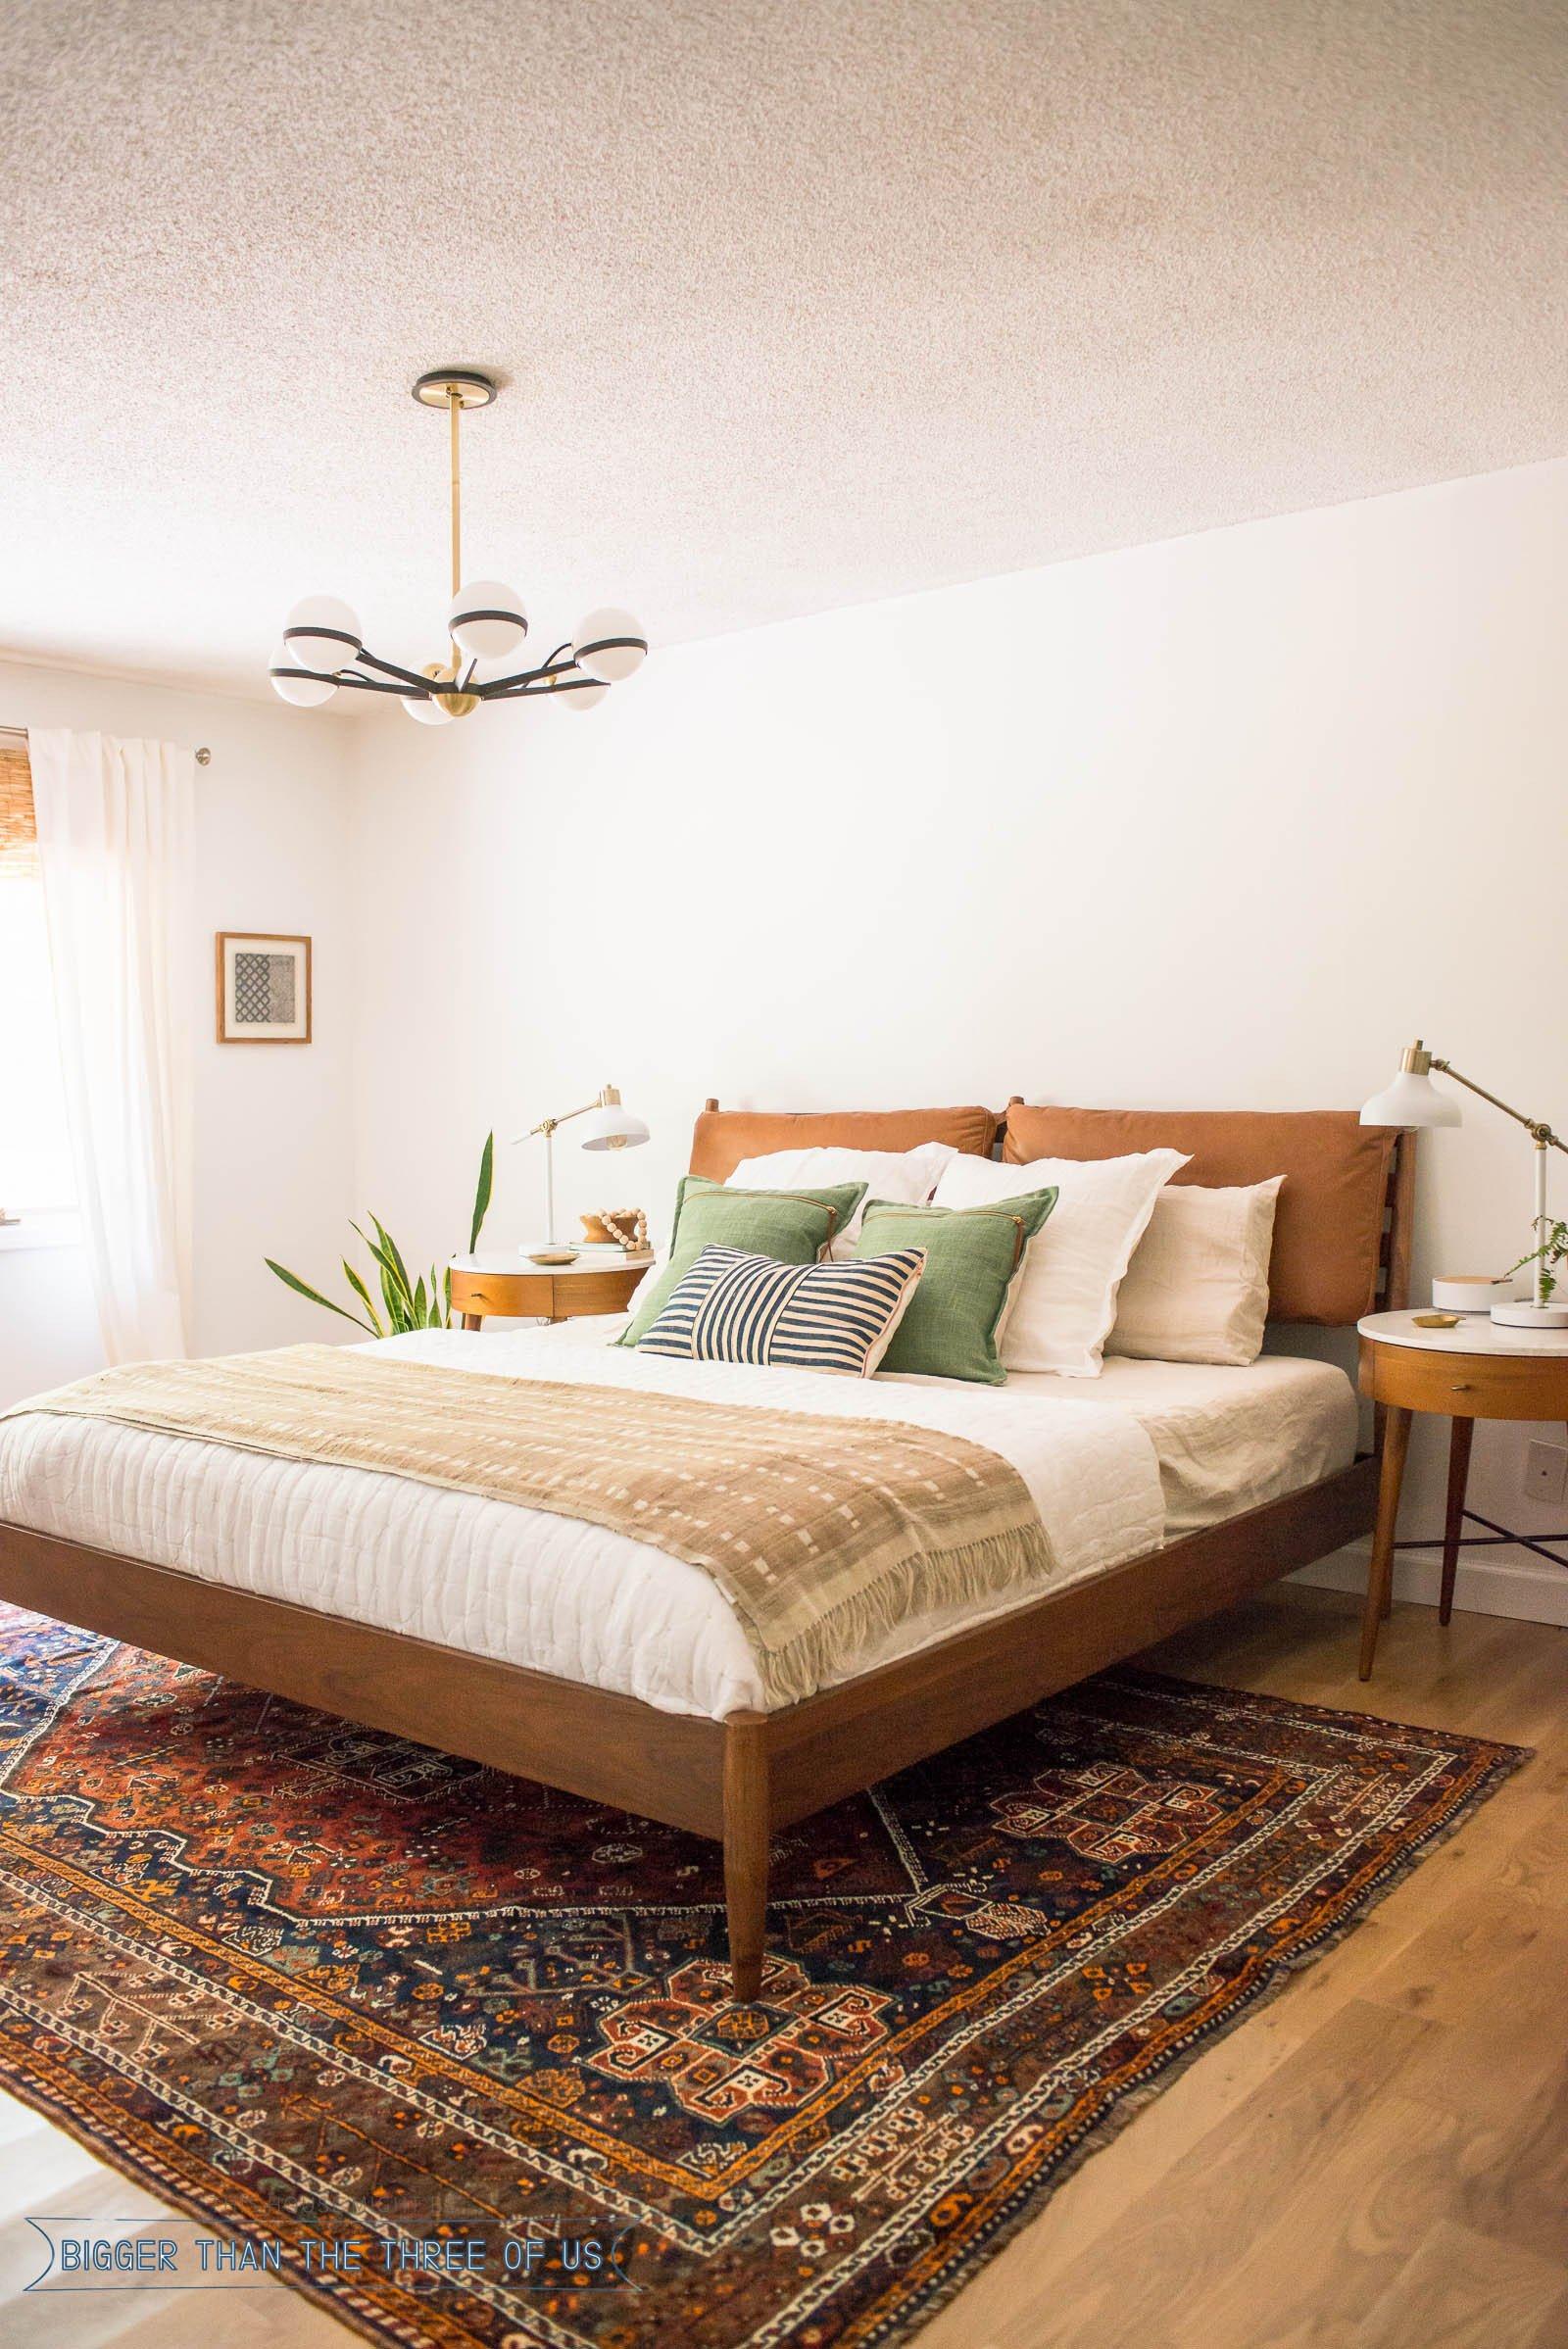 Mid Century Modern Bedroom Furniture Unique Mid Century Modern Bedroom Bigger Than the Three Of Us